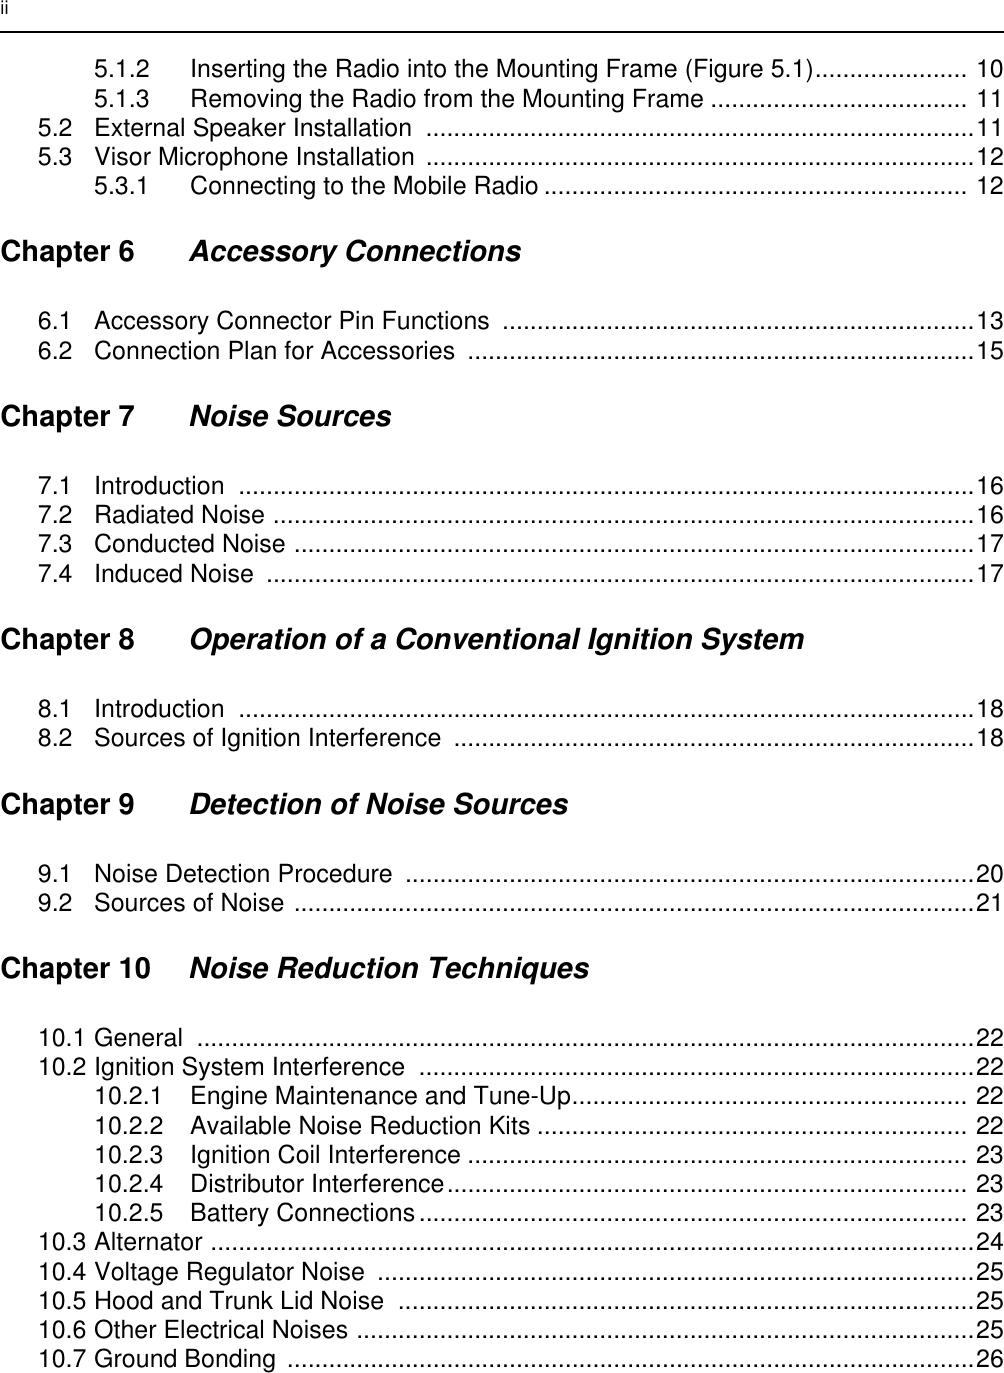 Motorola Pm400 Manual 2015 Toyota Tacoma Stereo Wiring Diagram Caroldoey Array Solutions 99ft3049 Cm200 Cm300 Vhf Mobile Radio User Rh Usermanual Wiki